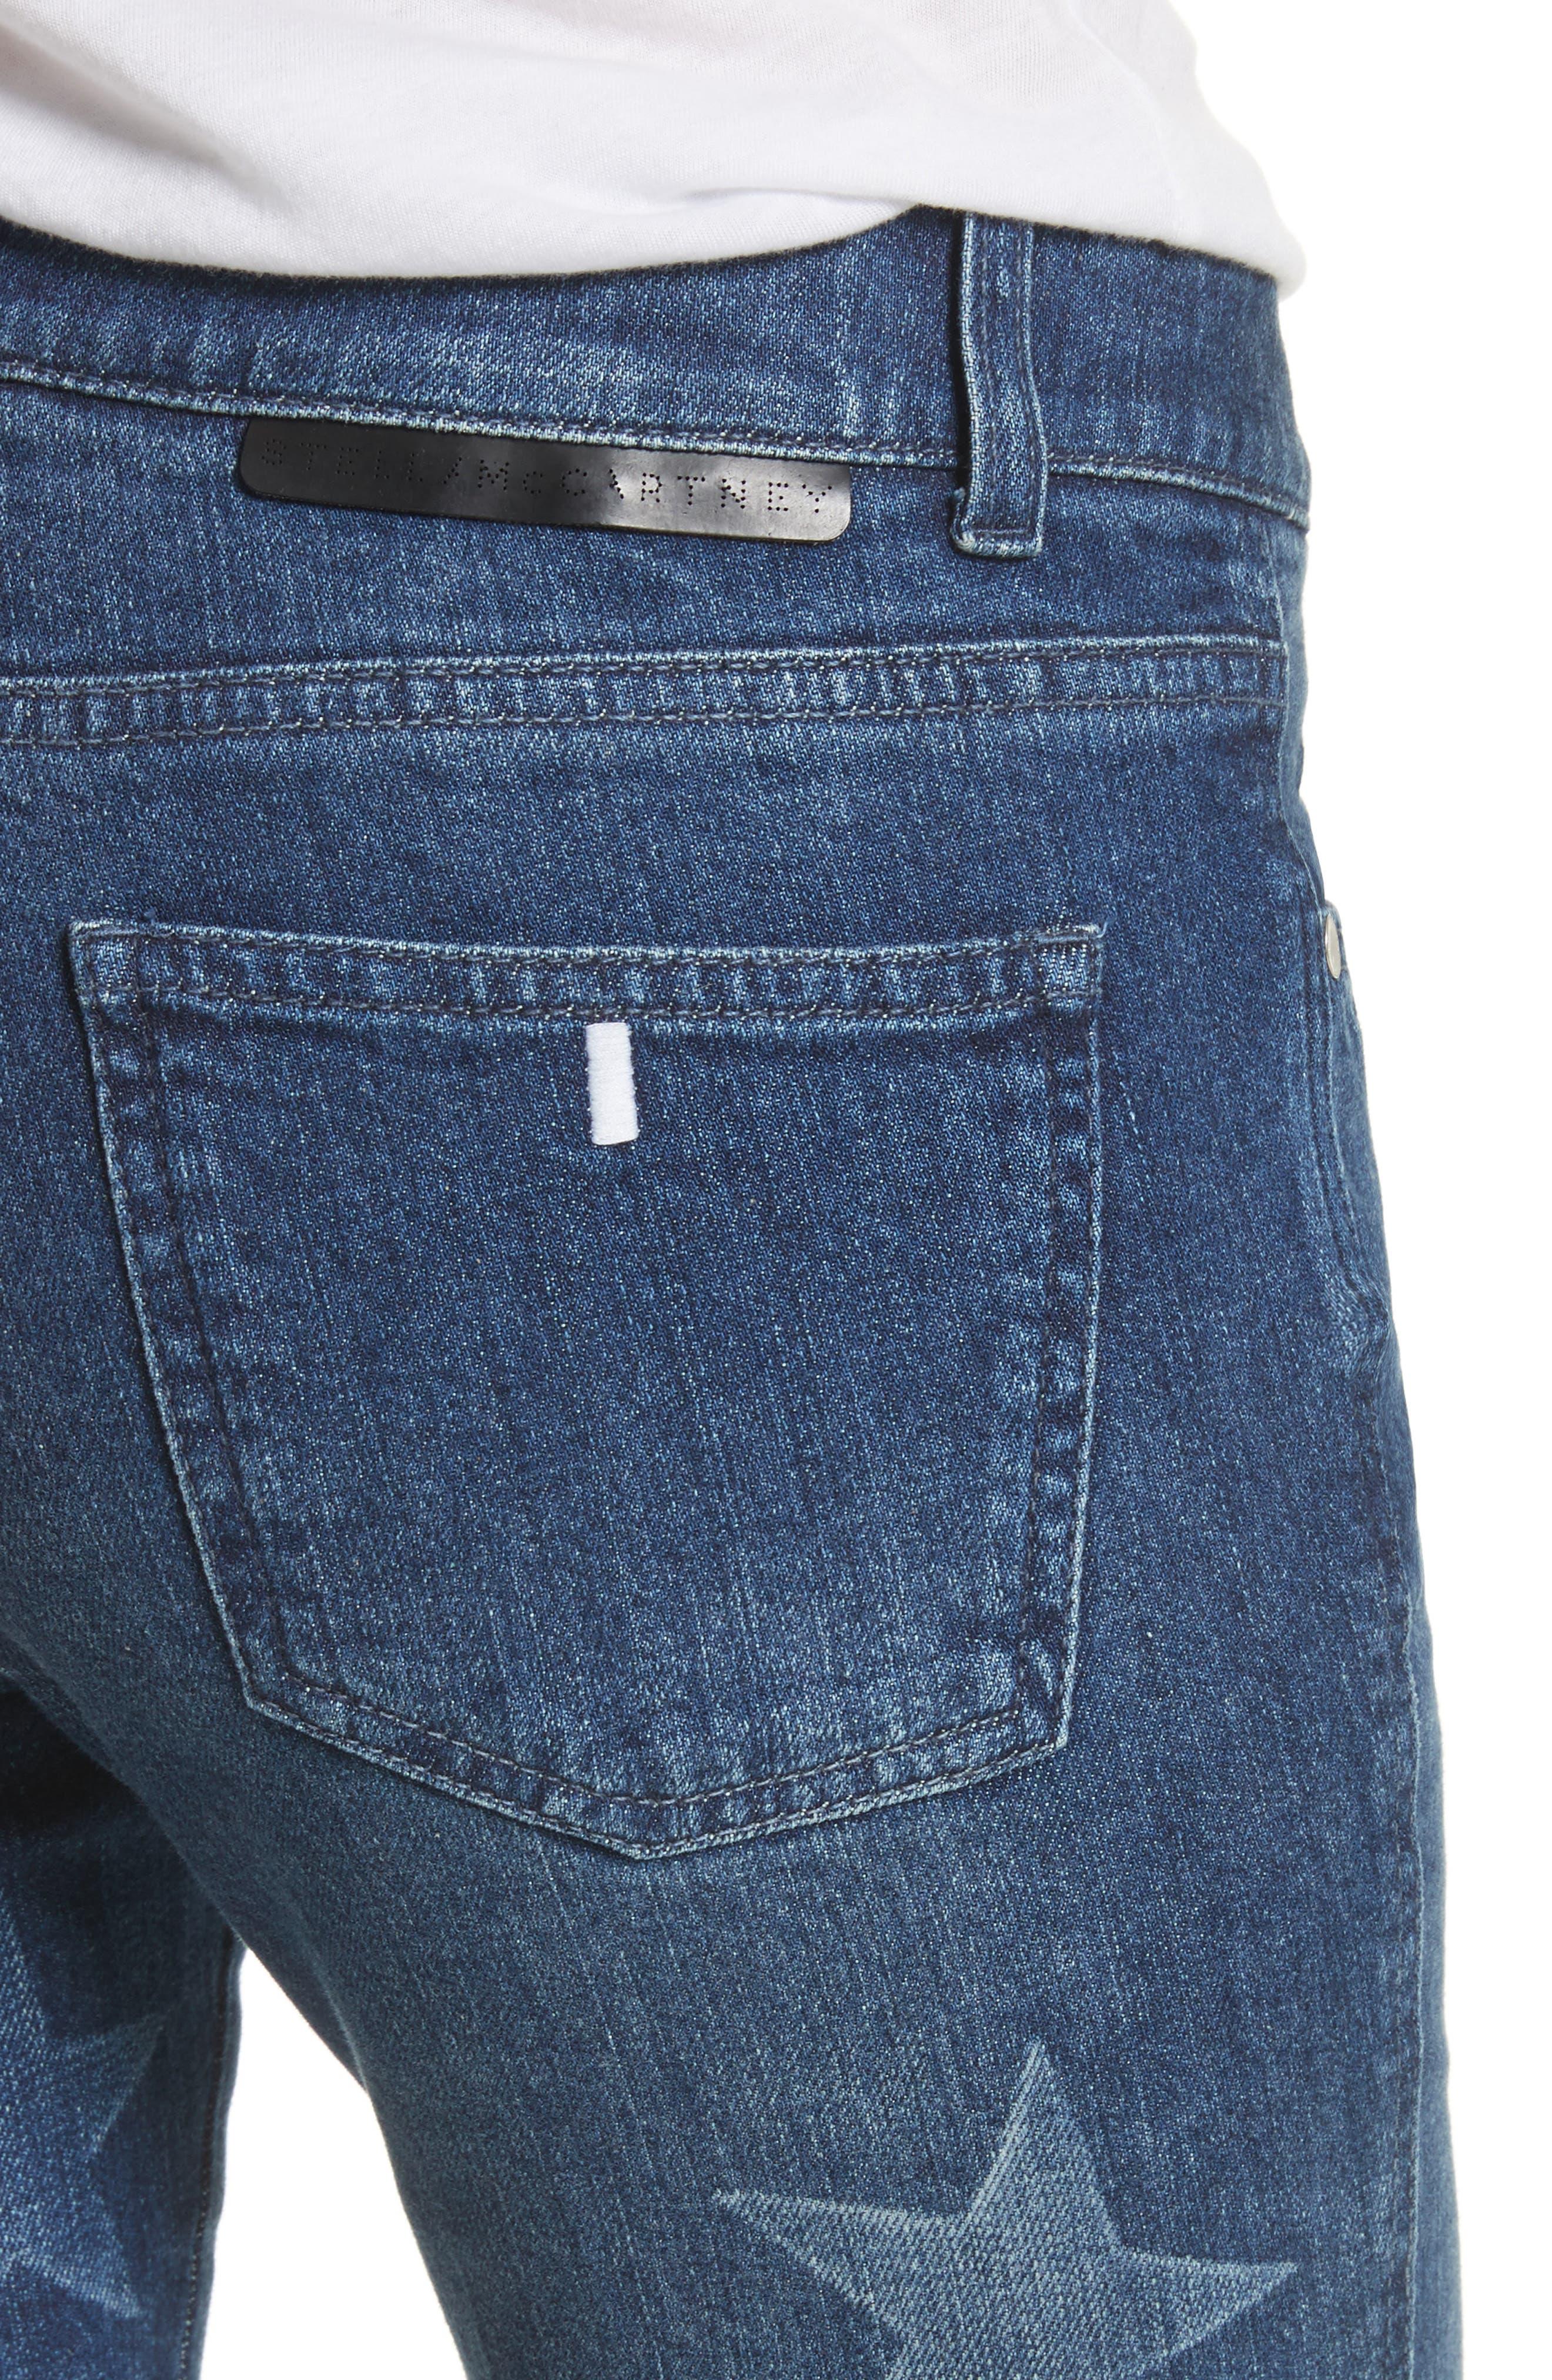 Skinny Ankle Grazer Star Jeans,                             Alternate thumbnail 4, color,                             430